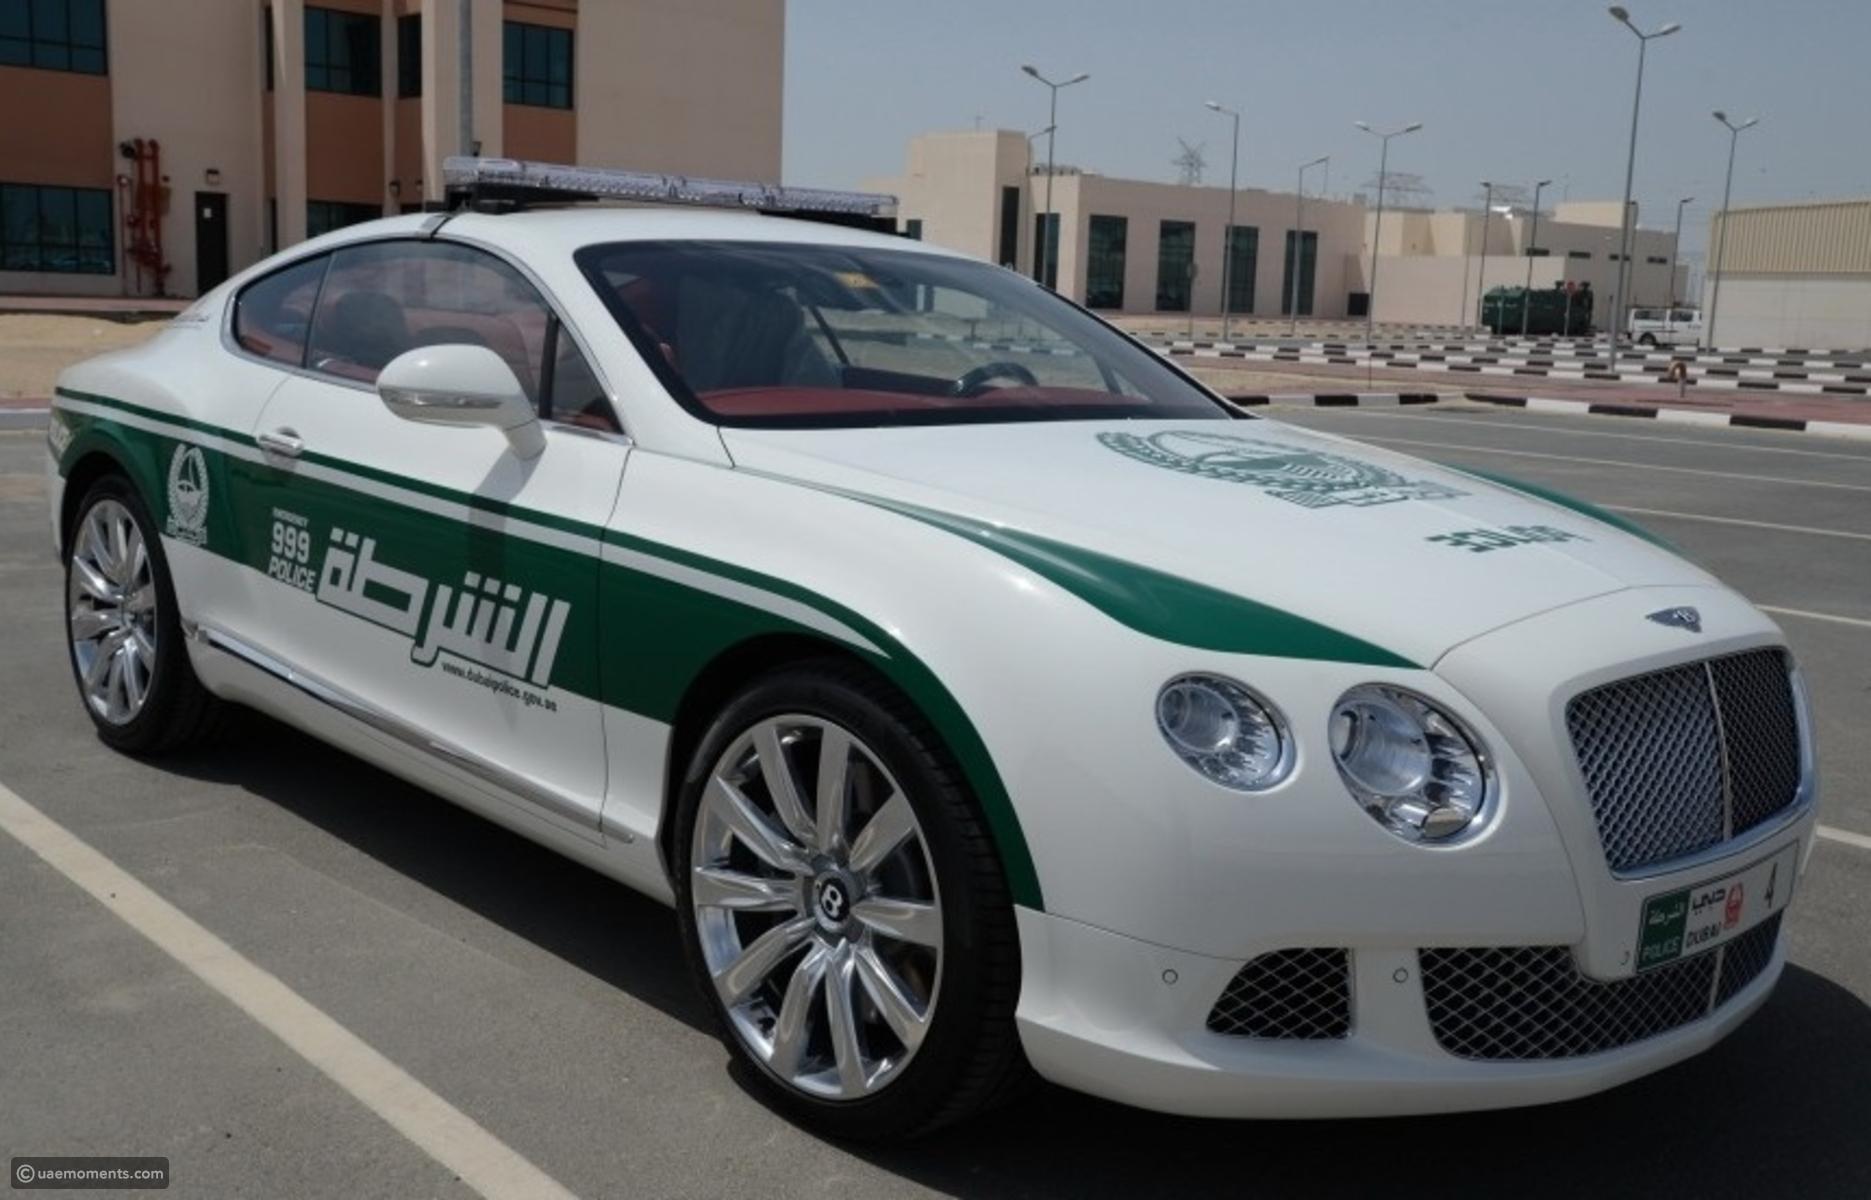 Top 10 Exotic Cars of Dubai Police Fleet e7awi